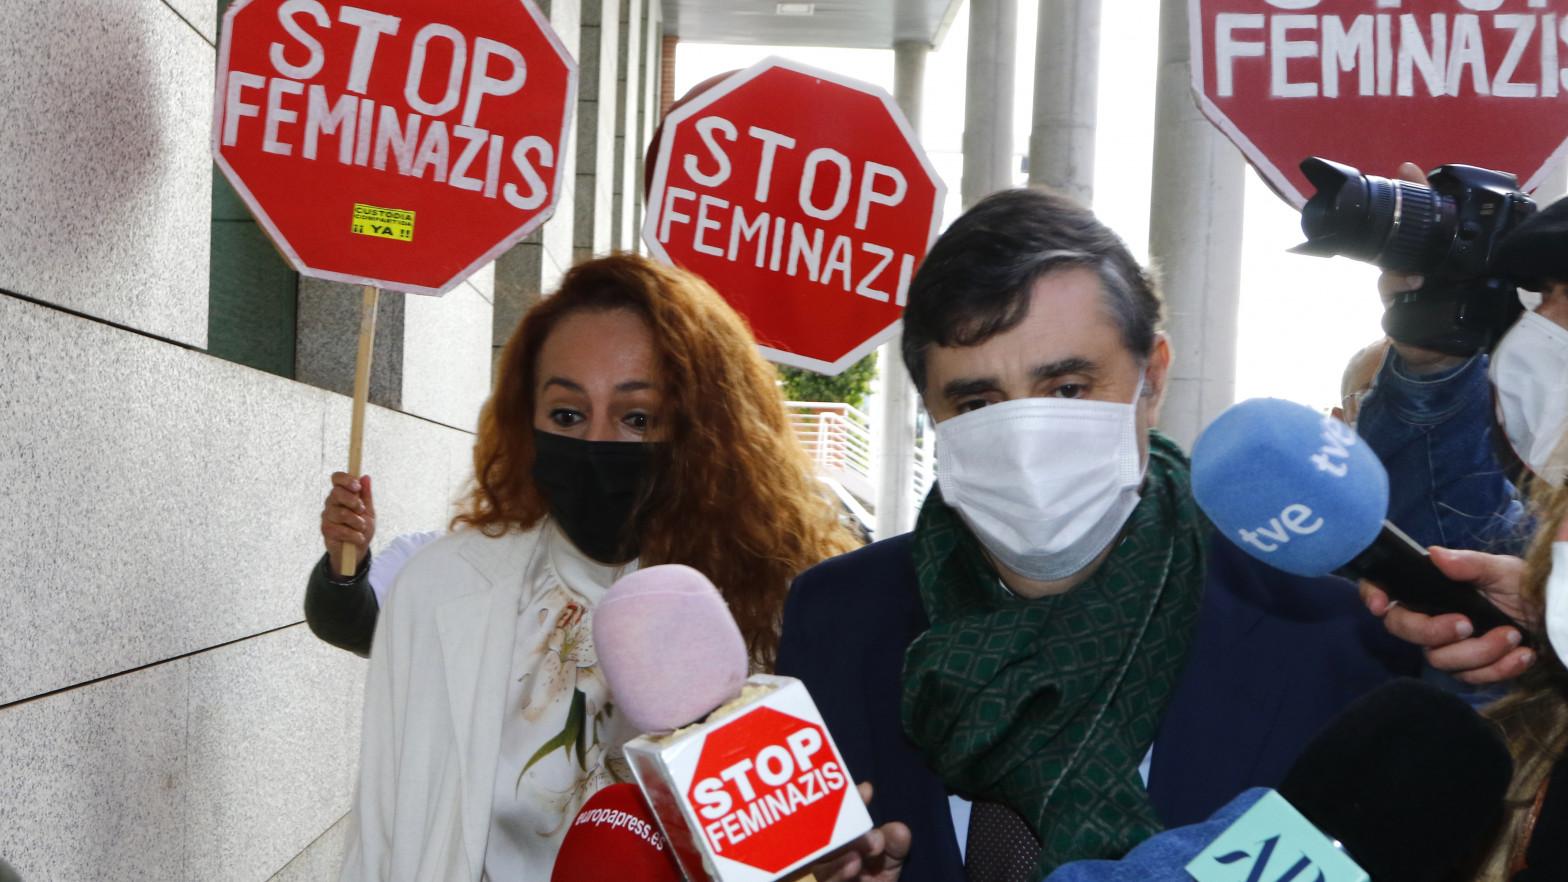 Rocío Carrasco, increpada en los juzgados con pancartas de 'Stop Feminazis'